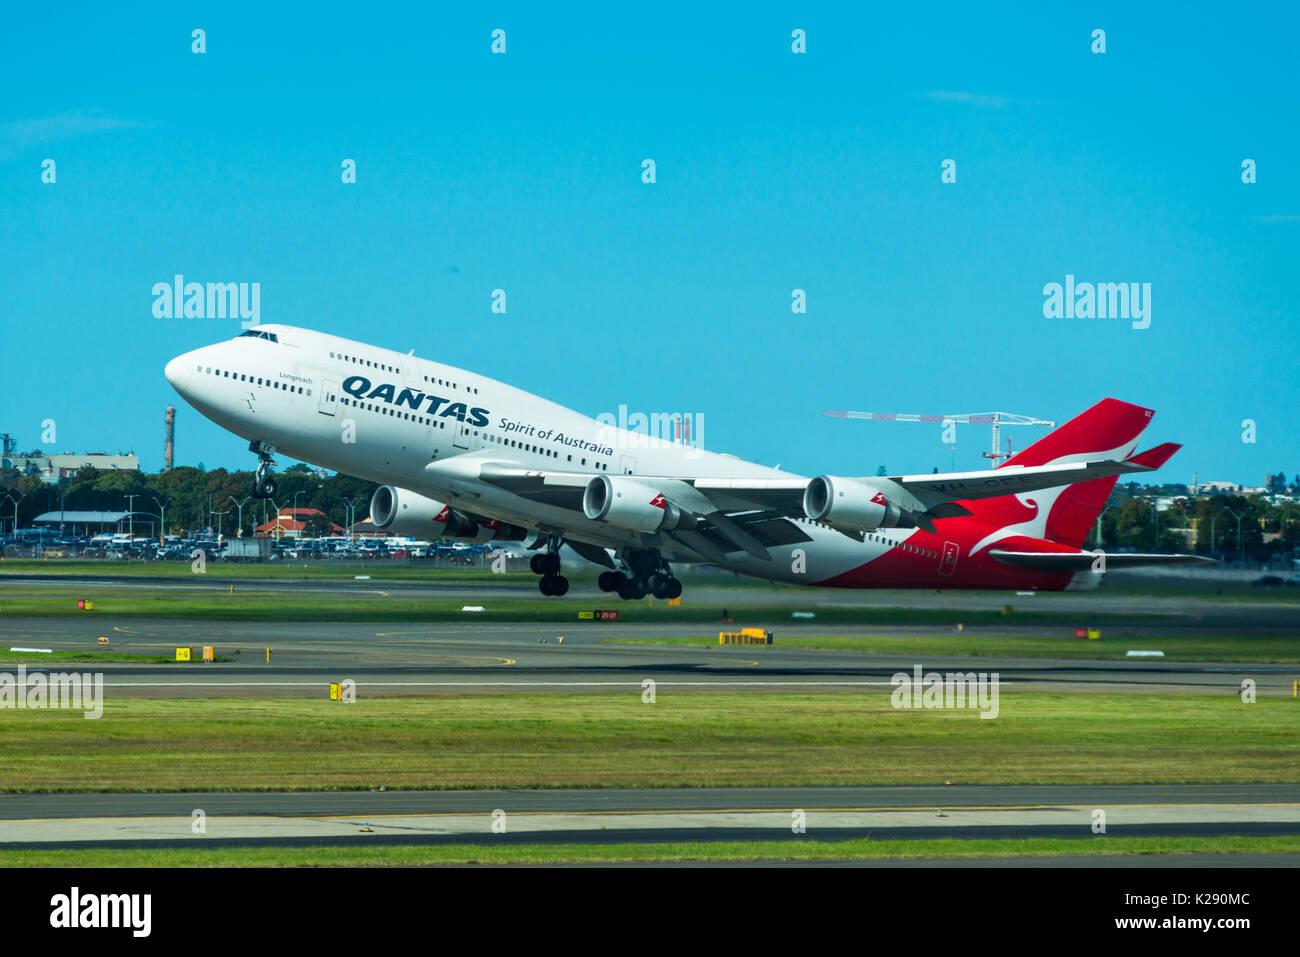 Qantas 747 jumbo jet taking off at Sydney International Airport, New South Wales, Australia. - Stock Image